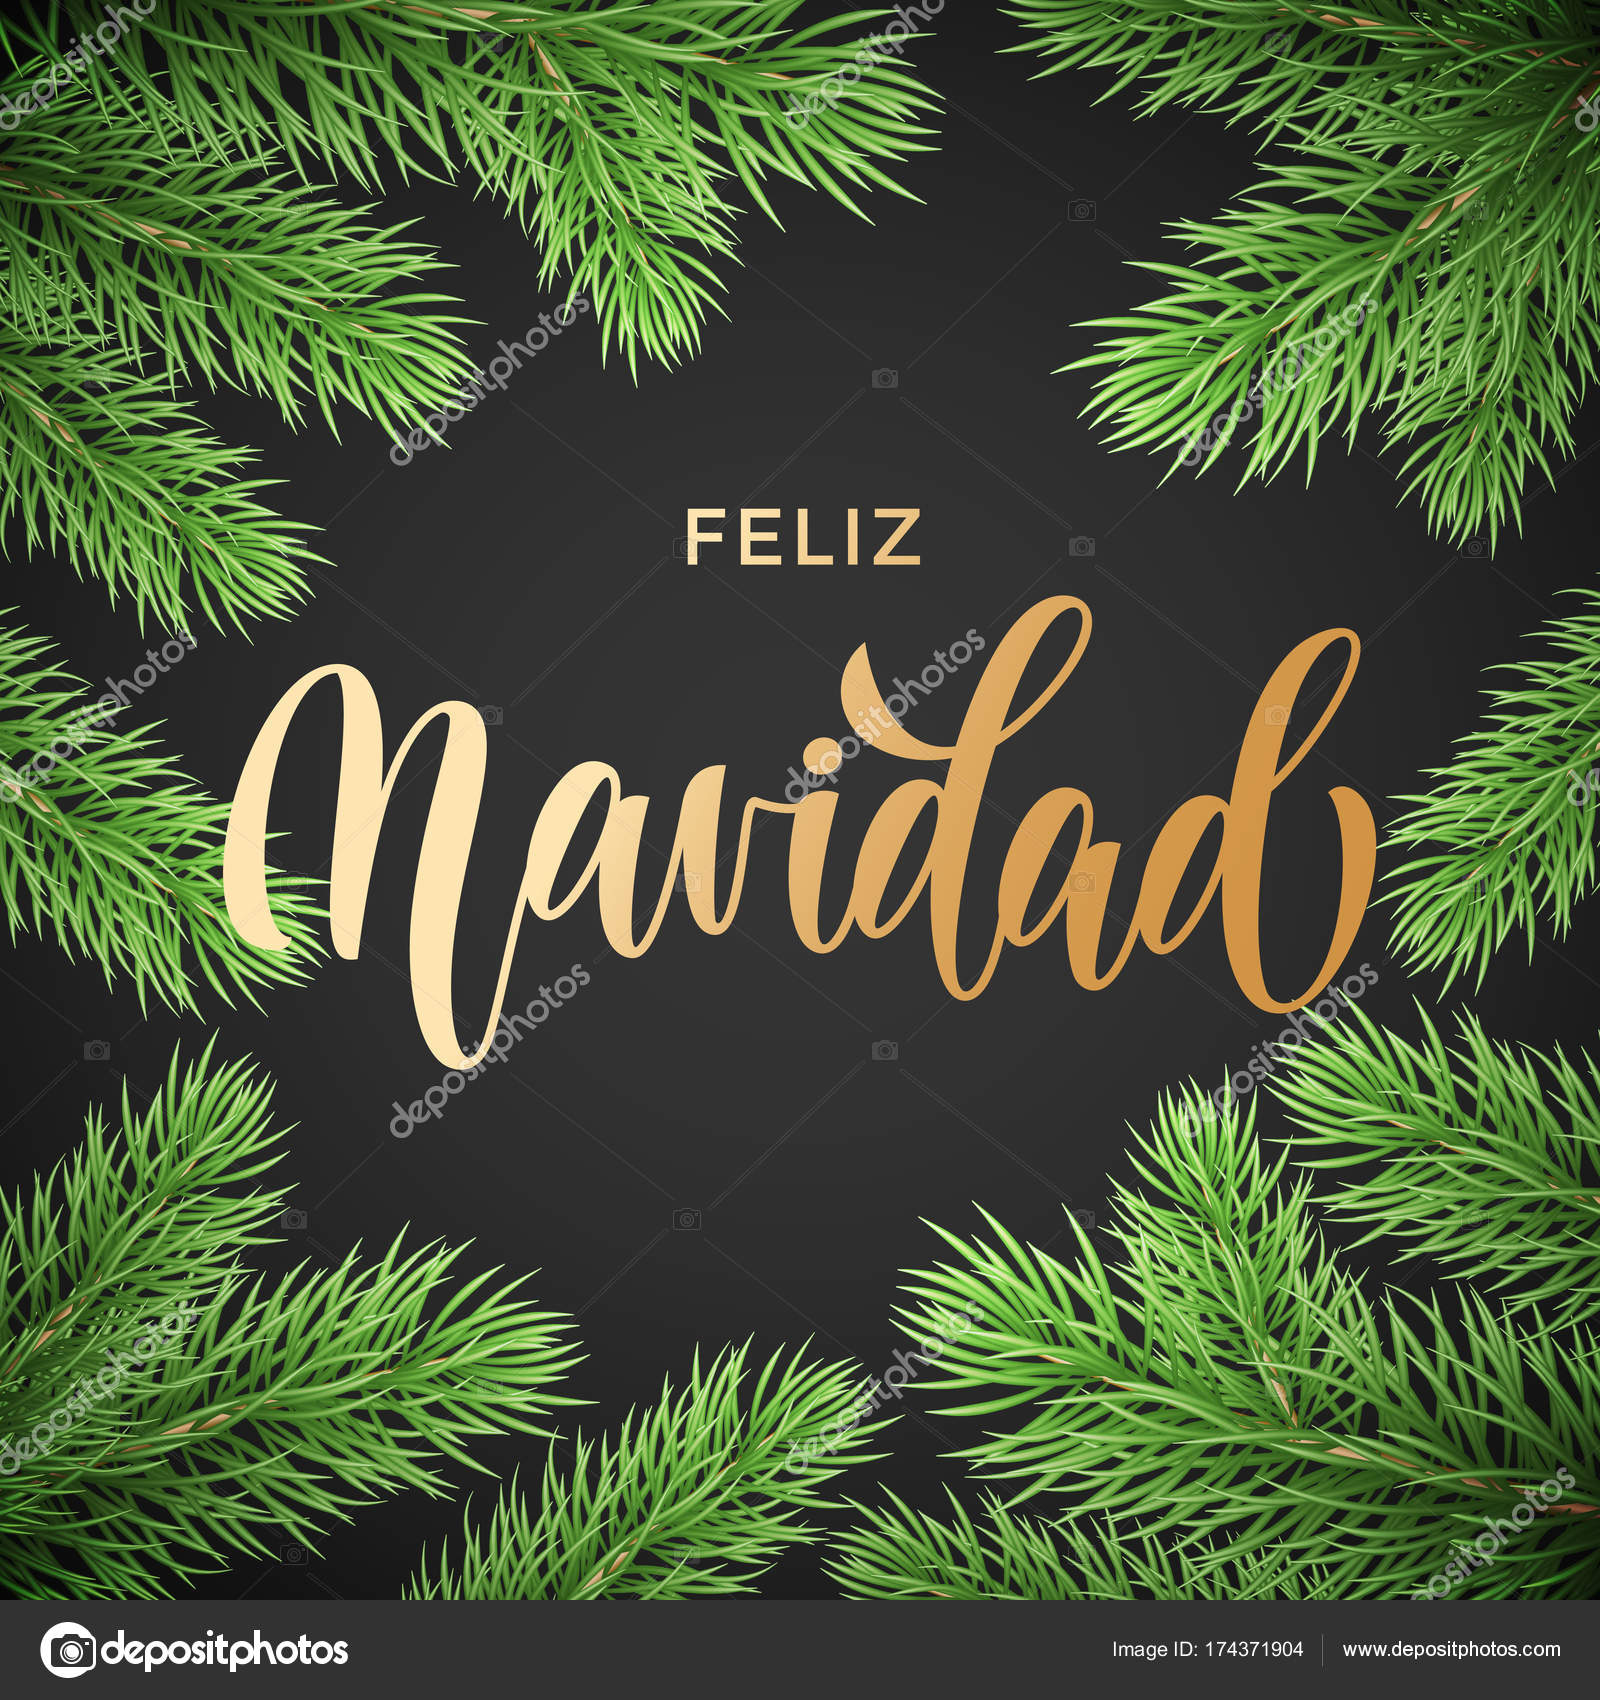 Feliz Navidad Spanish Merry Christmas Hand Drawn Golden Calligraphy